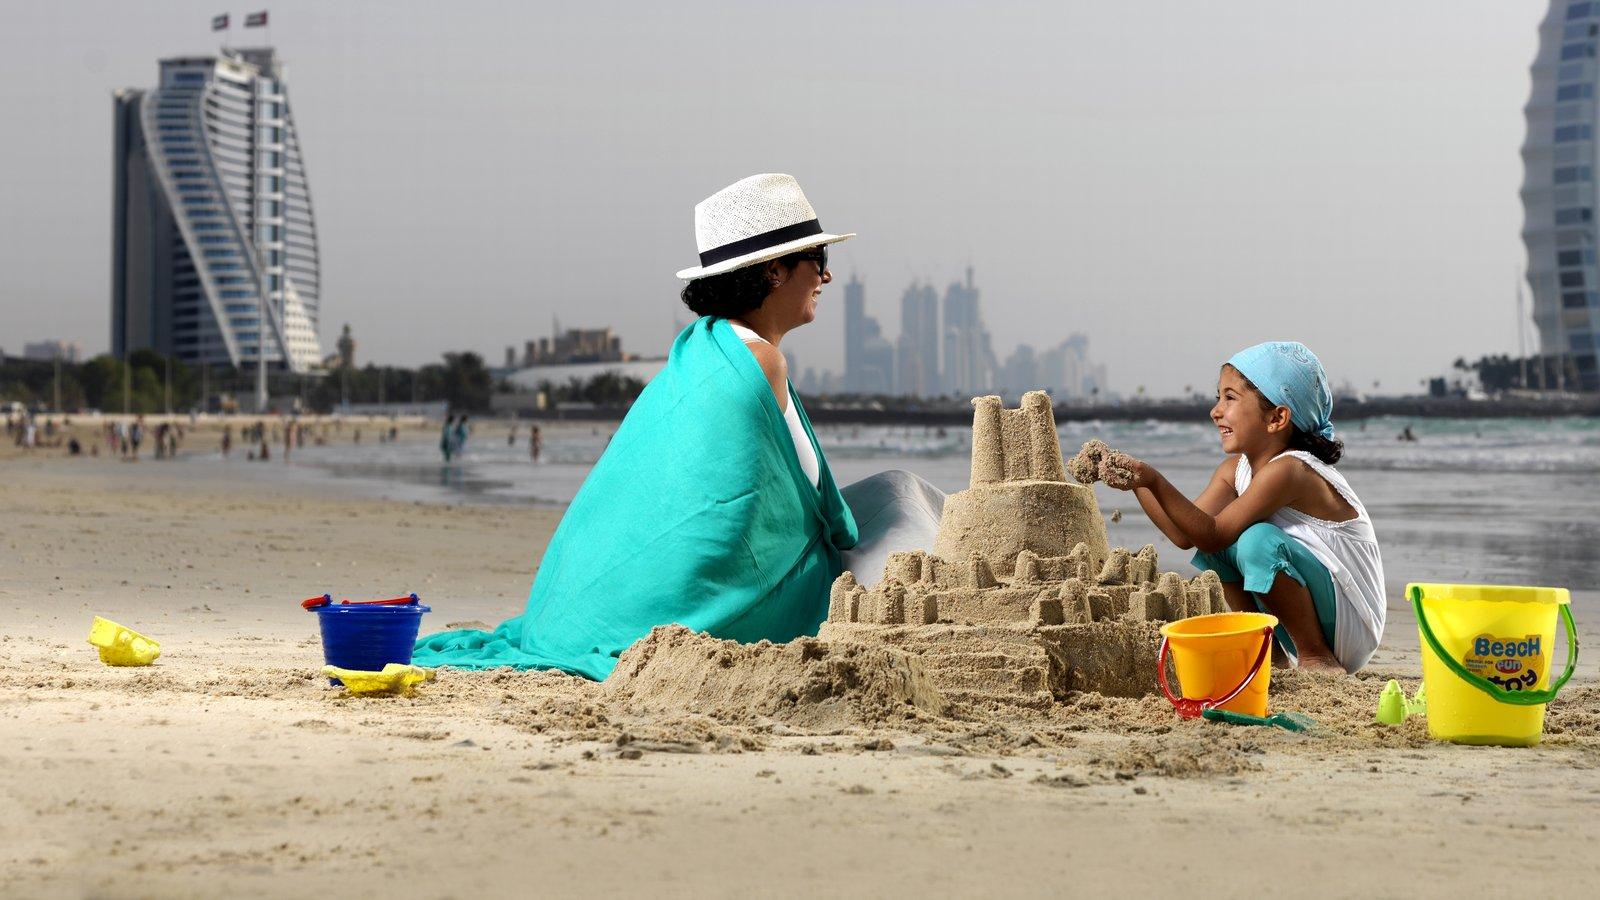 Jumeira Beach and Park which includes a beach as well as a family